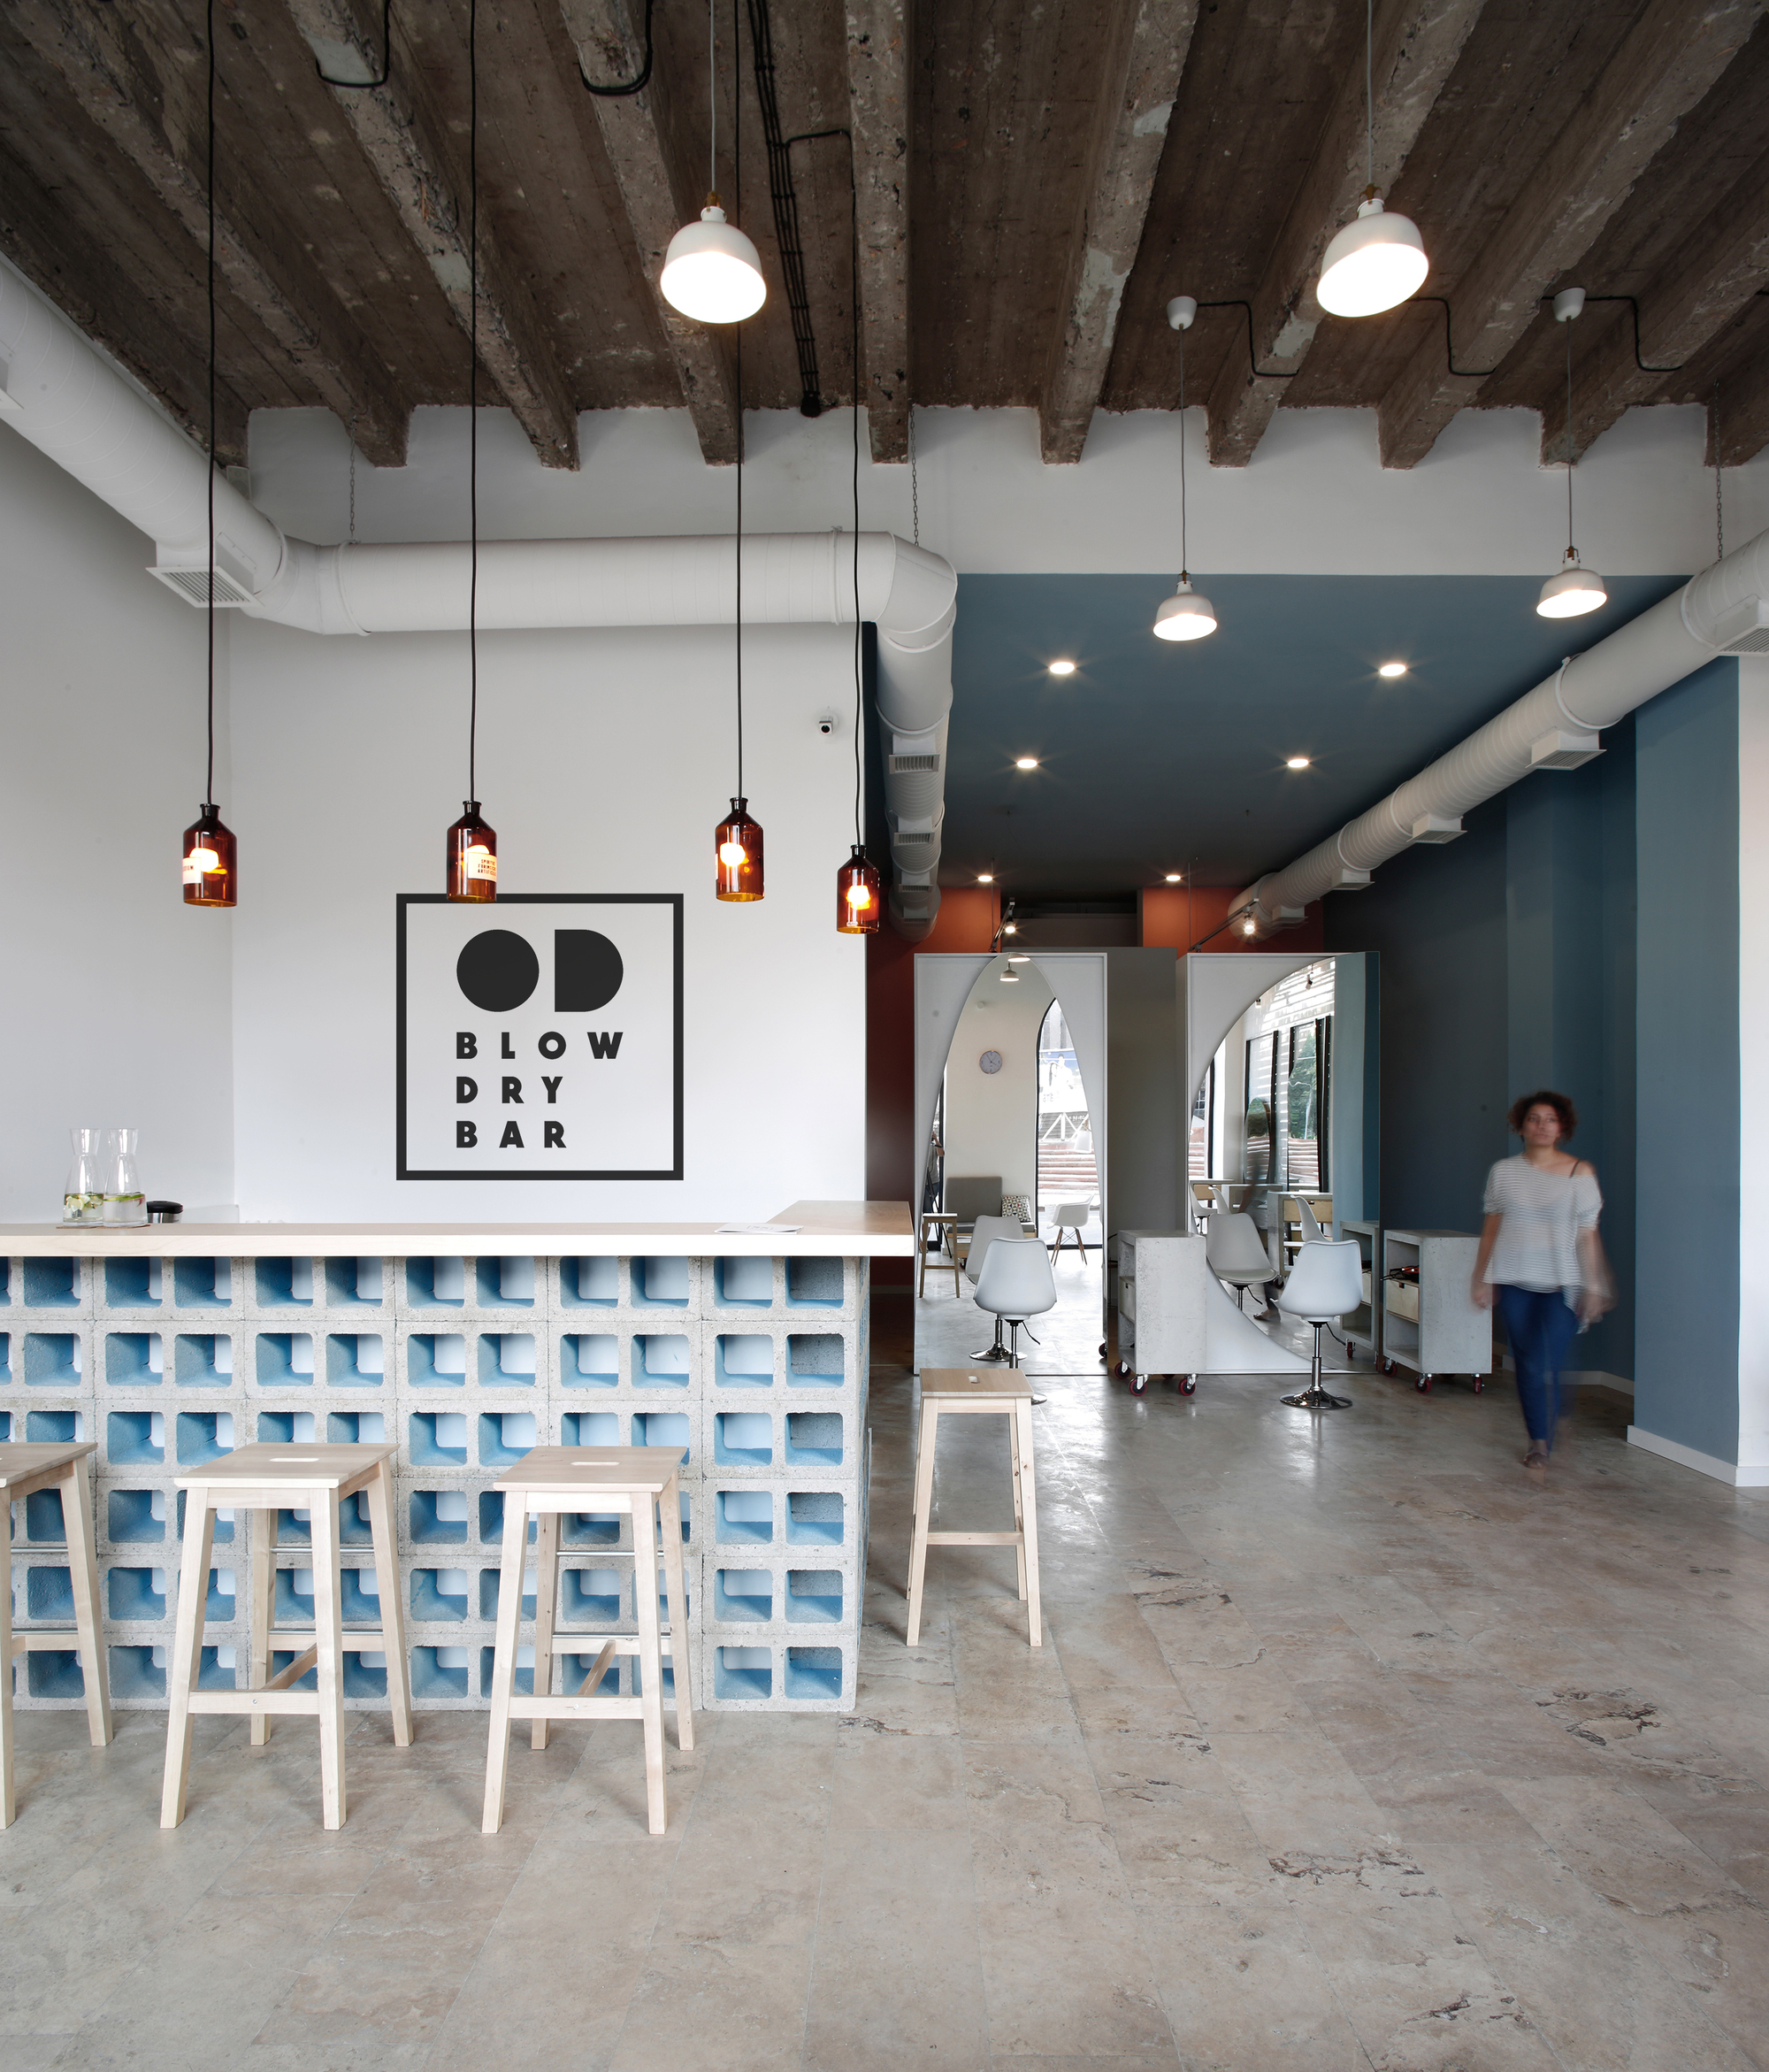 OD Blow Dry Bar / Snkh Studio